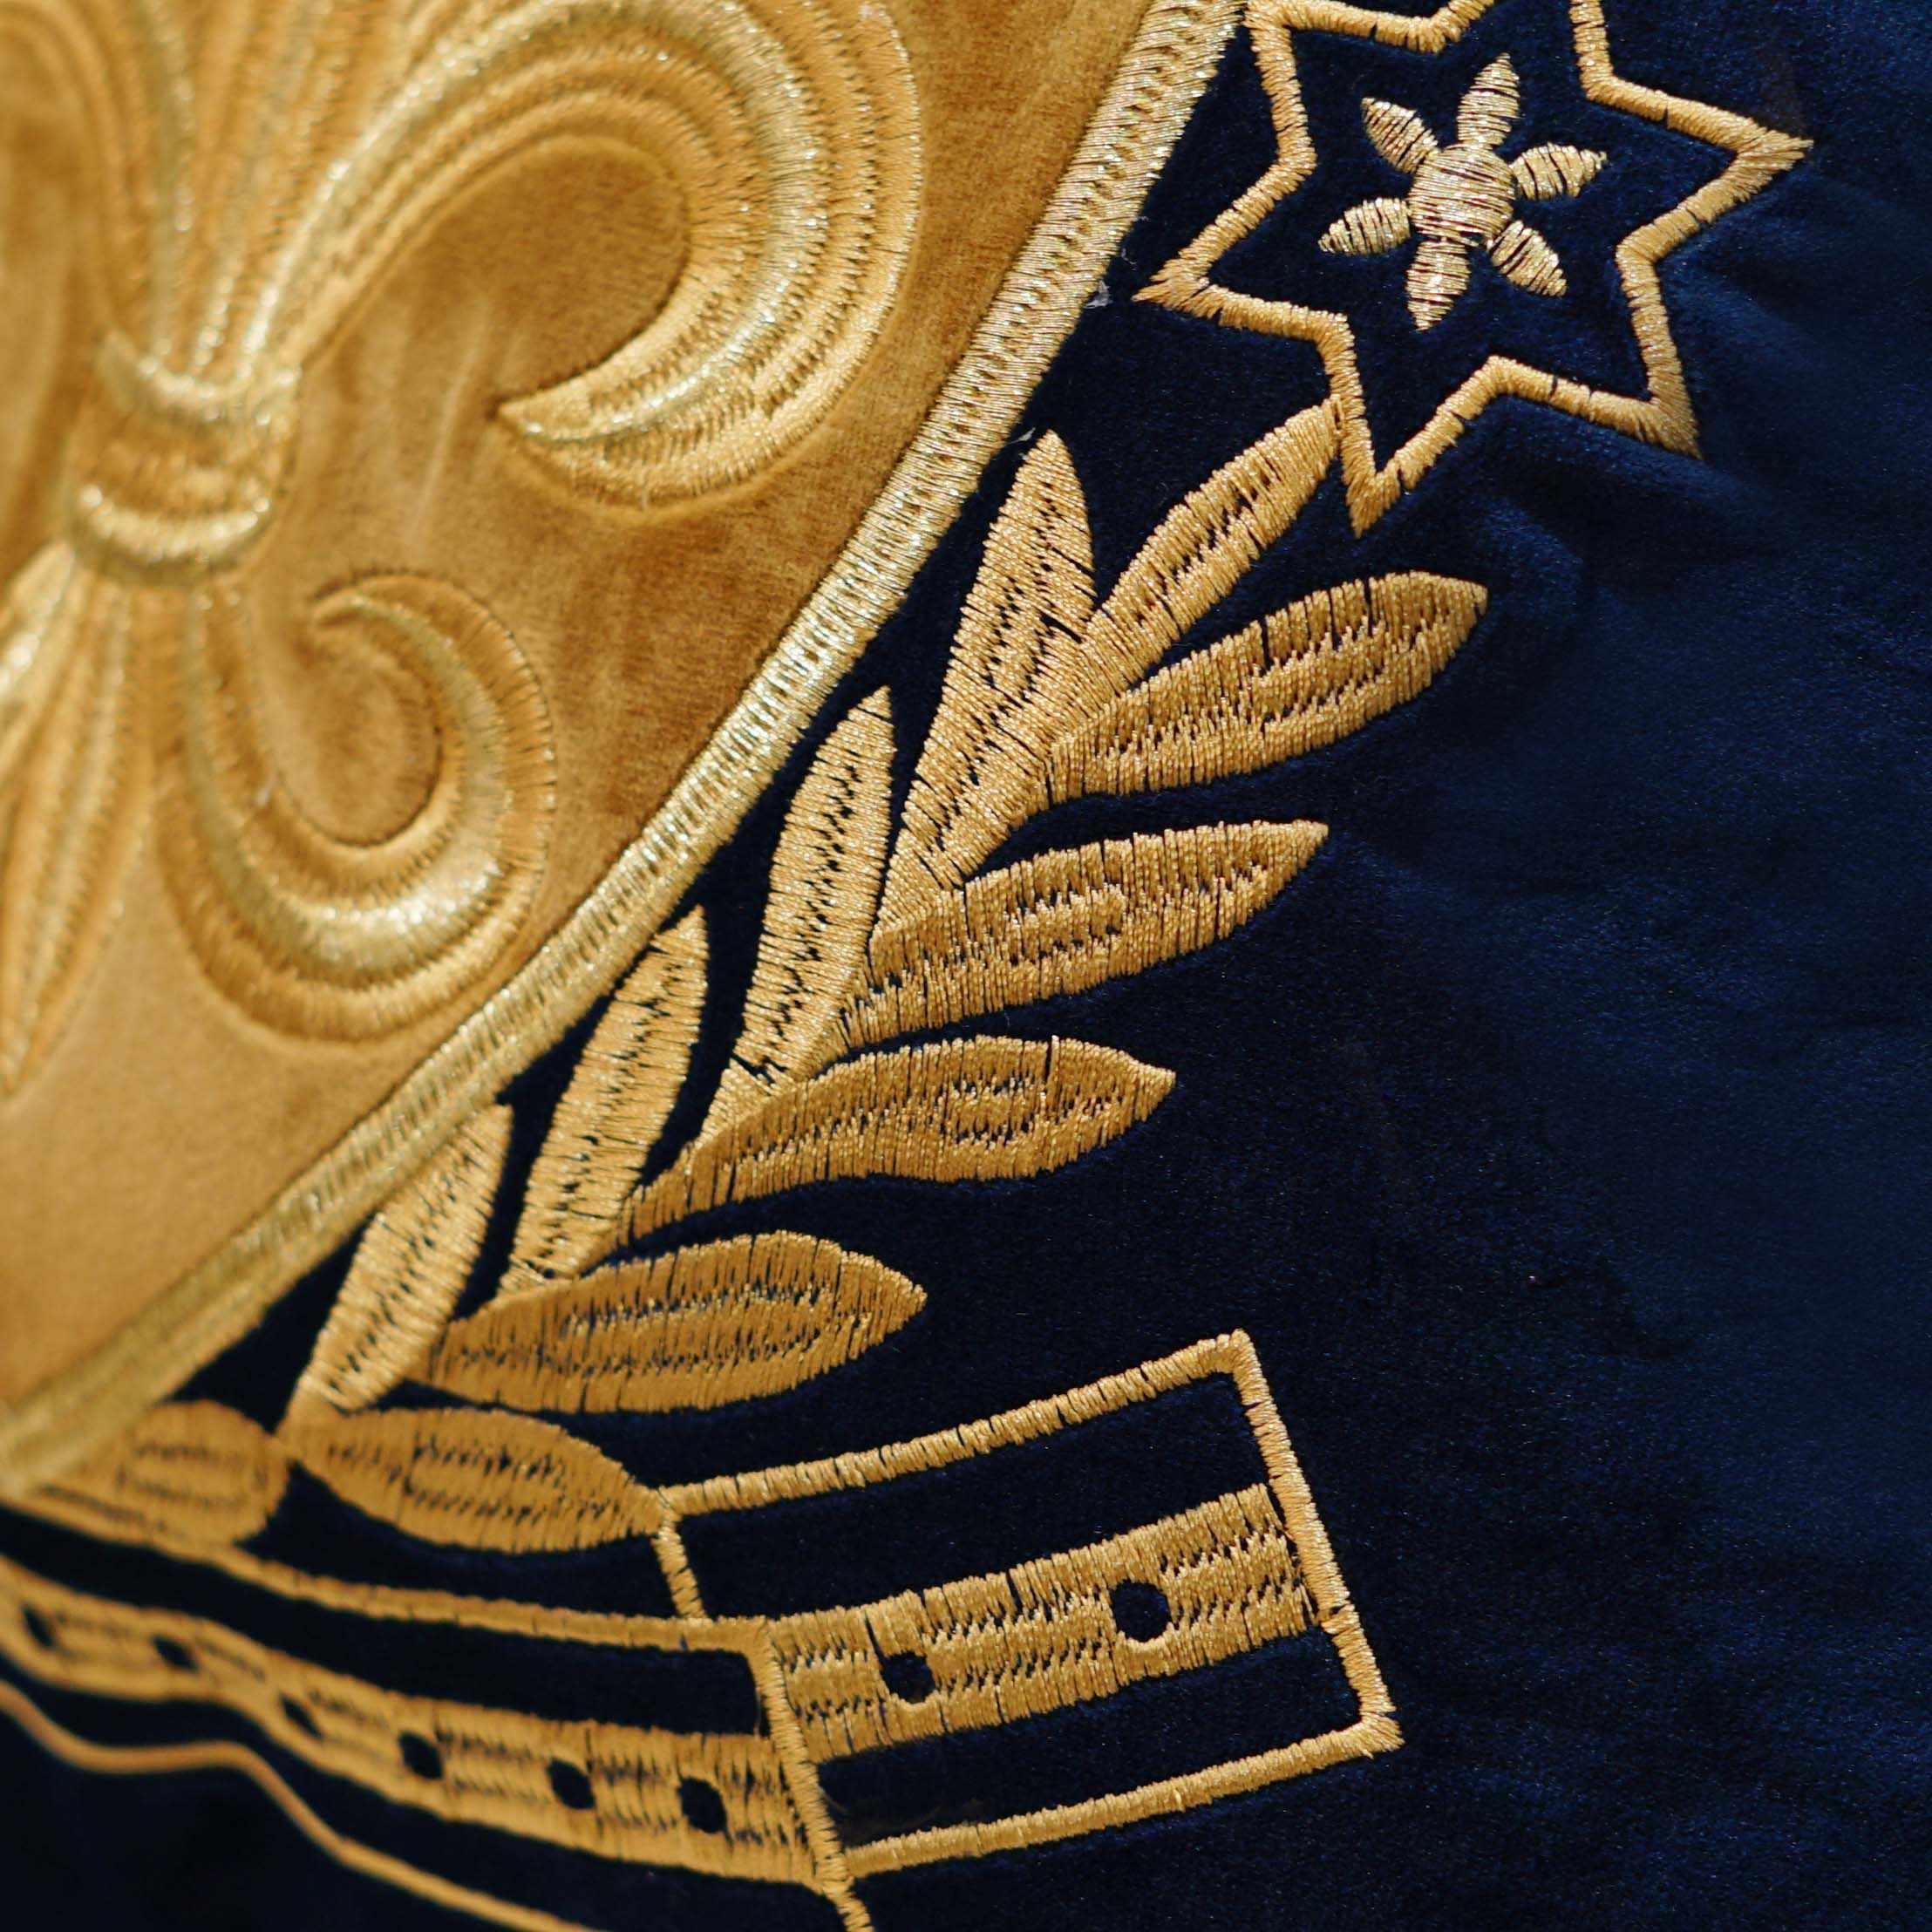 Avigers Ouro Bordado Fronha Capa de Almofada de Veludo de Luxo Europeu Geometria Fronha Casa Decorativo Sofá Jogar Travesseiro